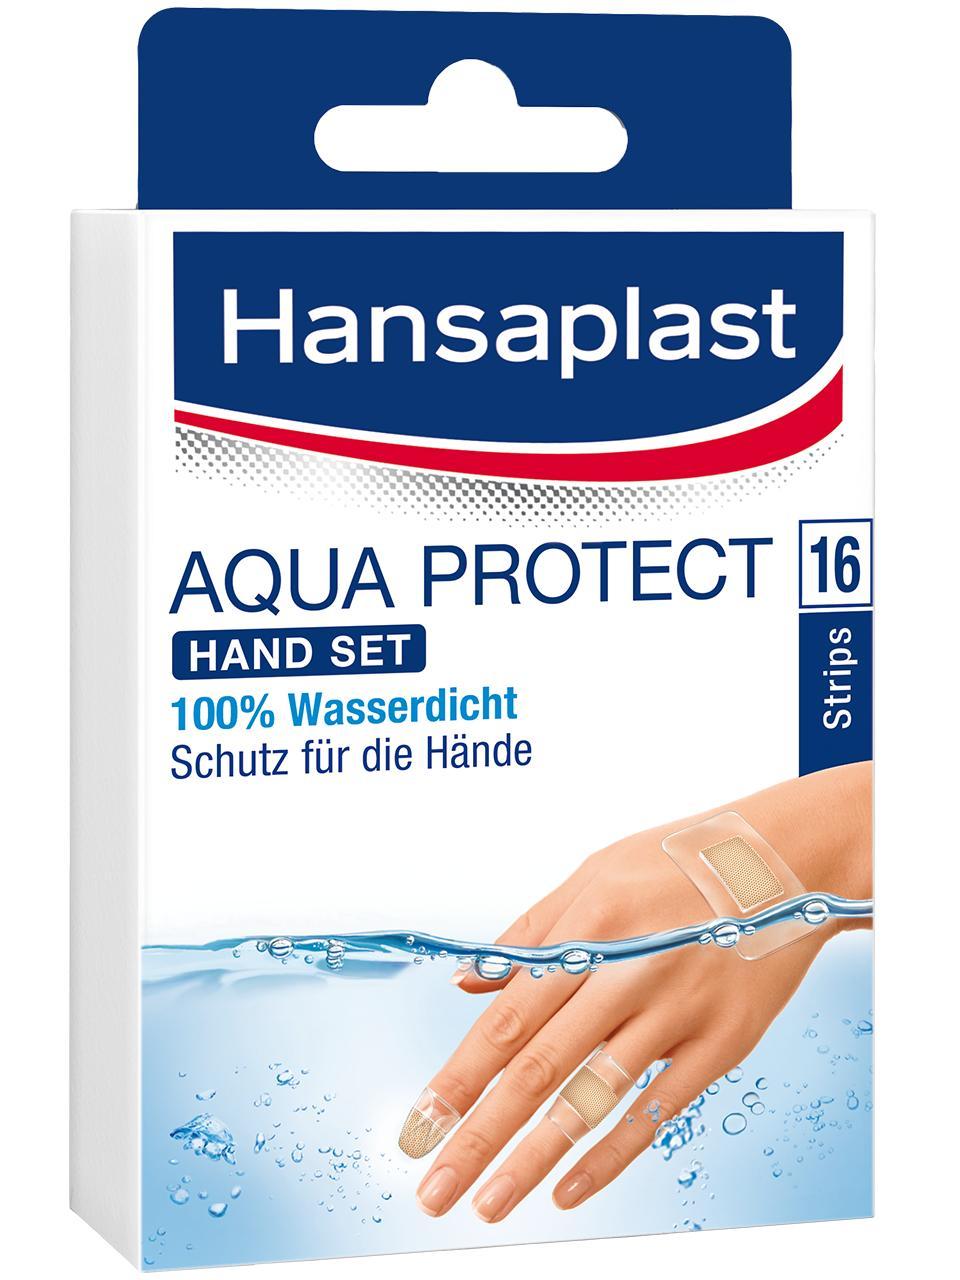 Hansaplast Aqua Protect Hand Set.